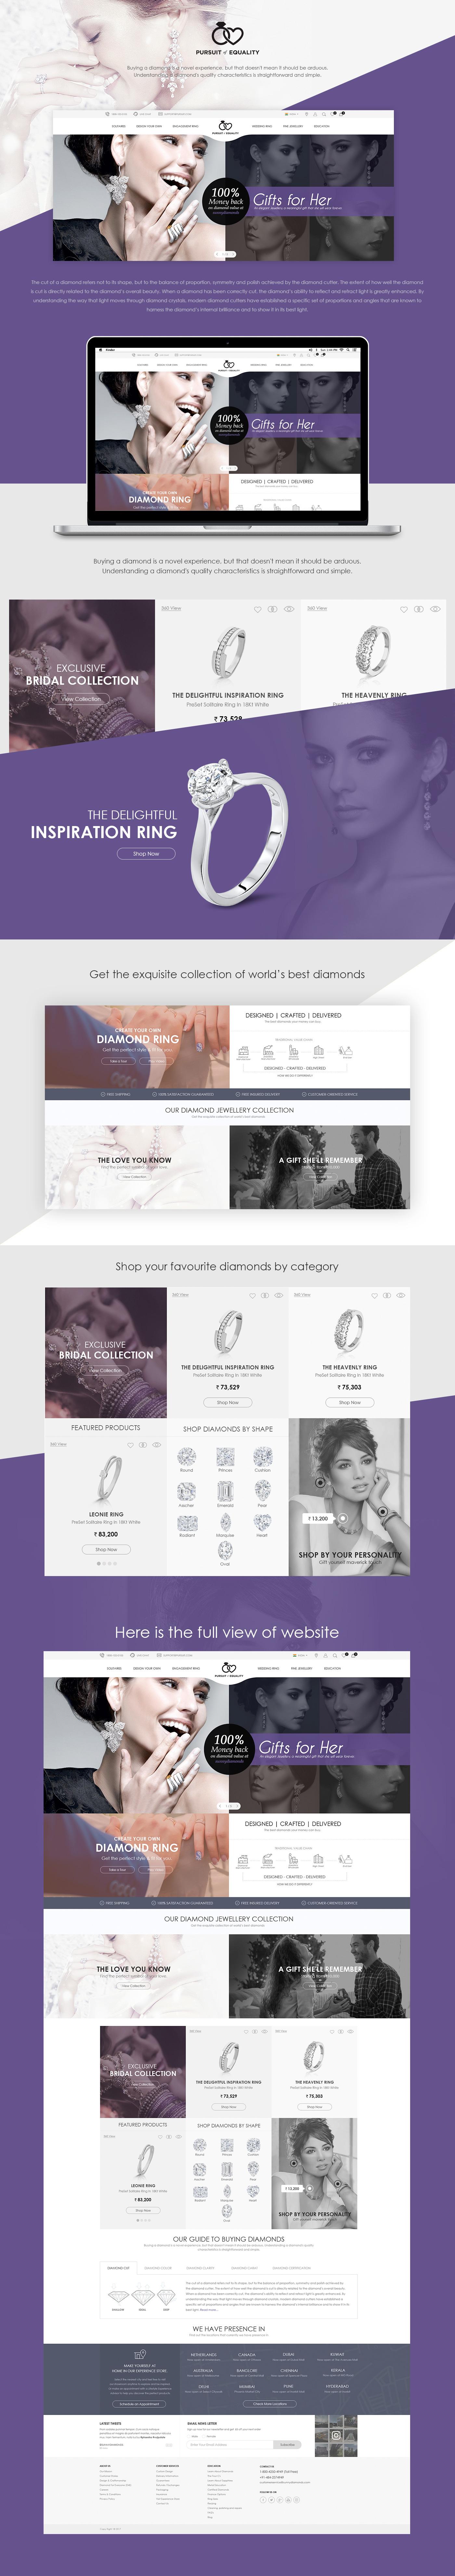 Website Design ui design UX design graphic design  Responsive Design Jewellery Diamond jewellery  Web Design  branding